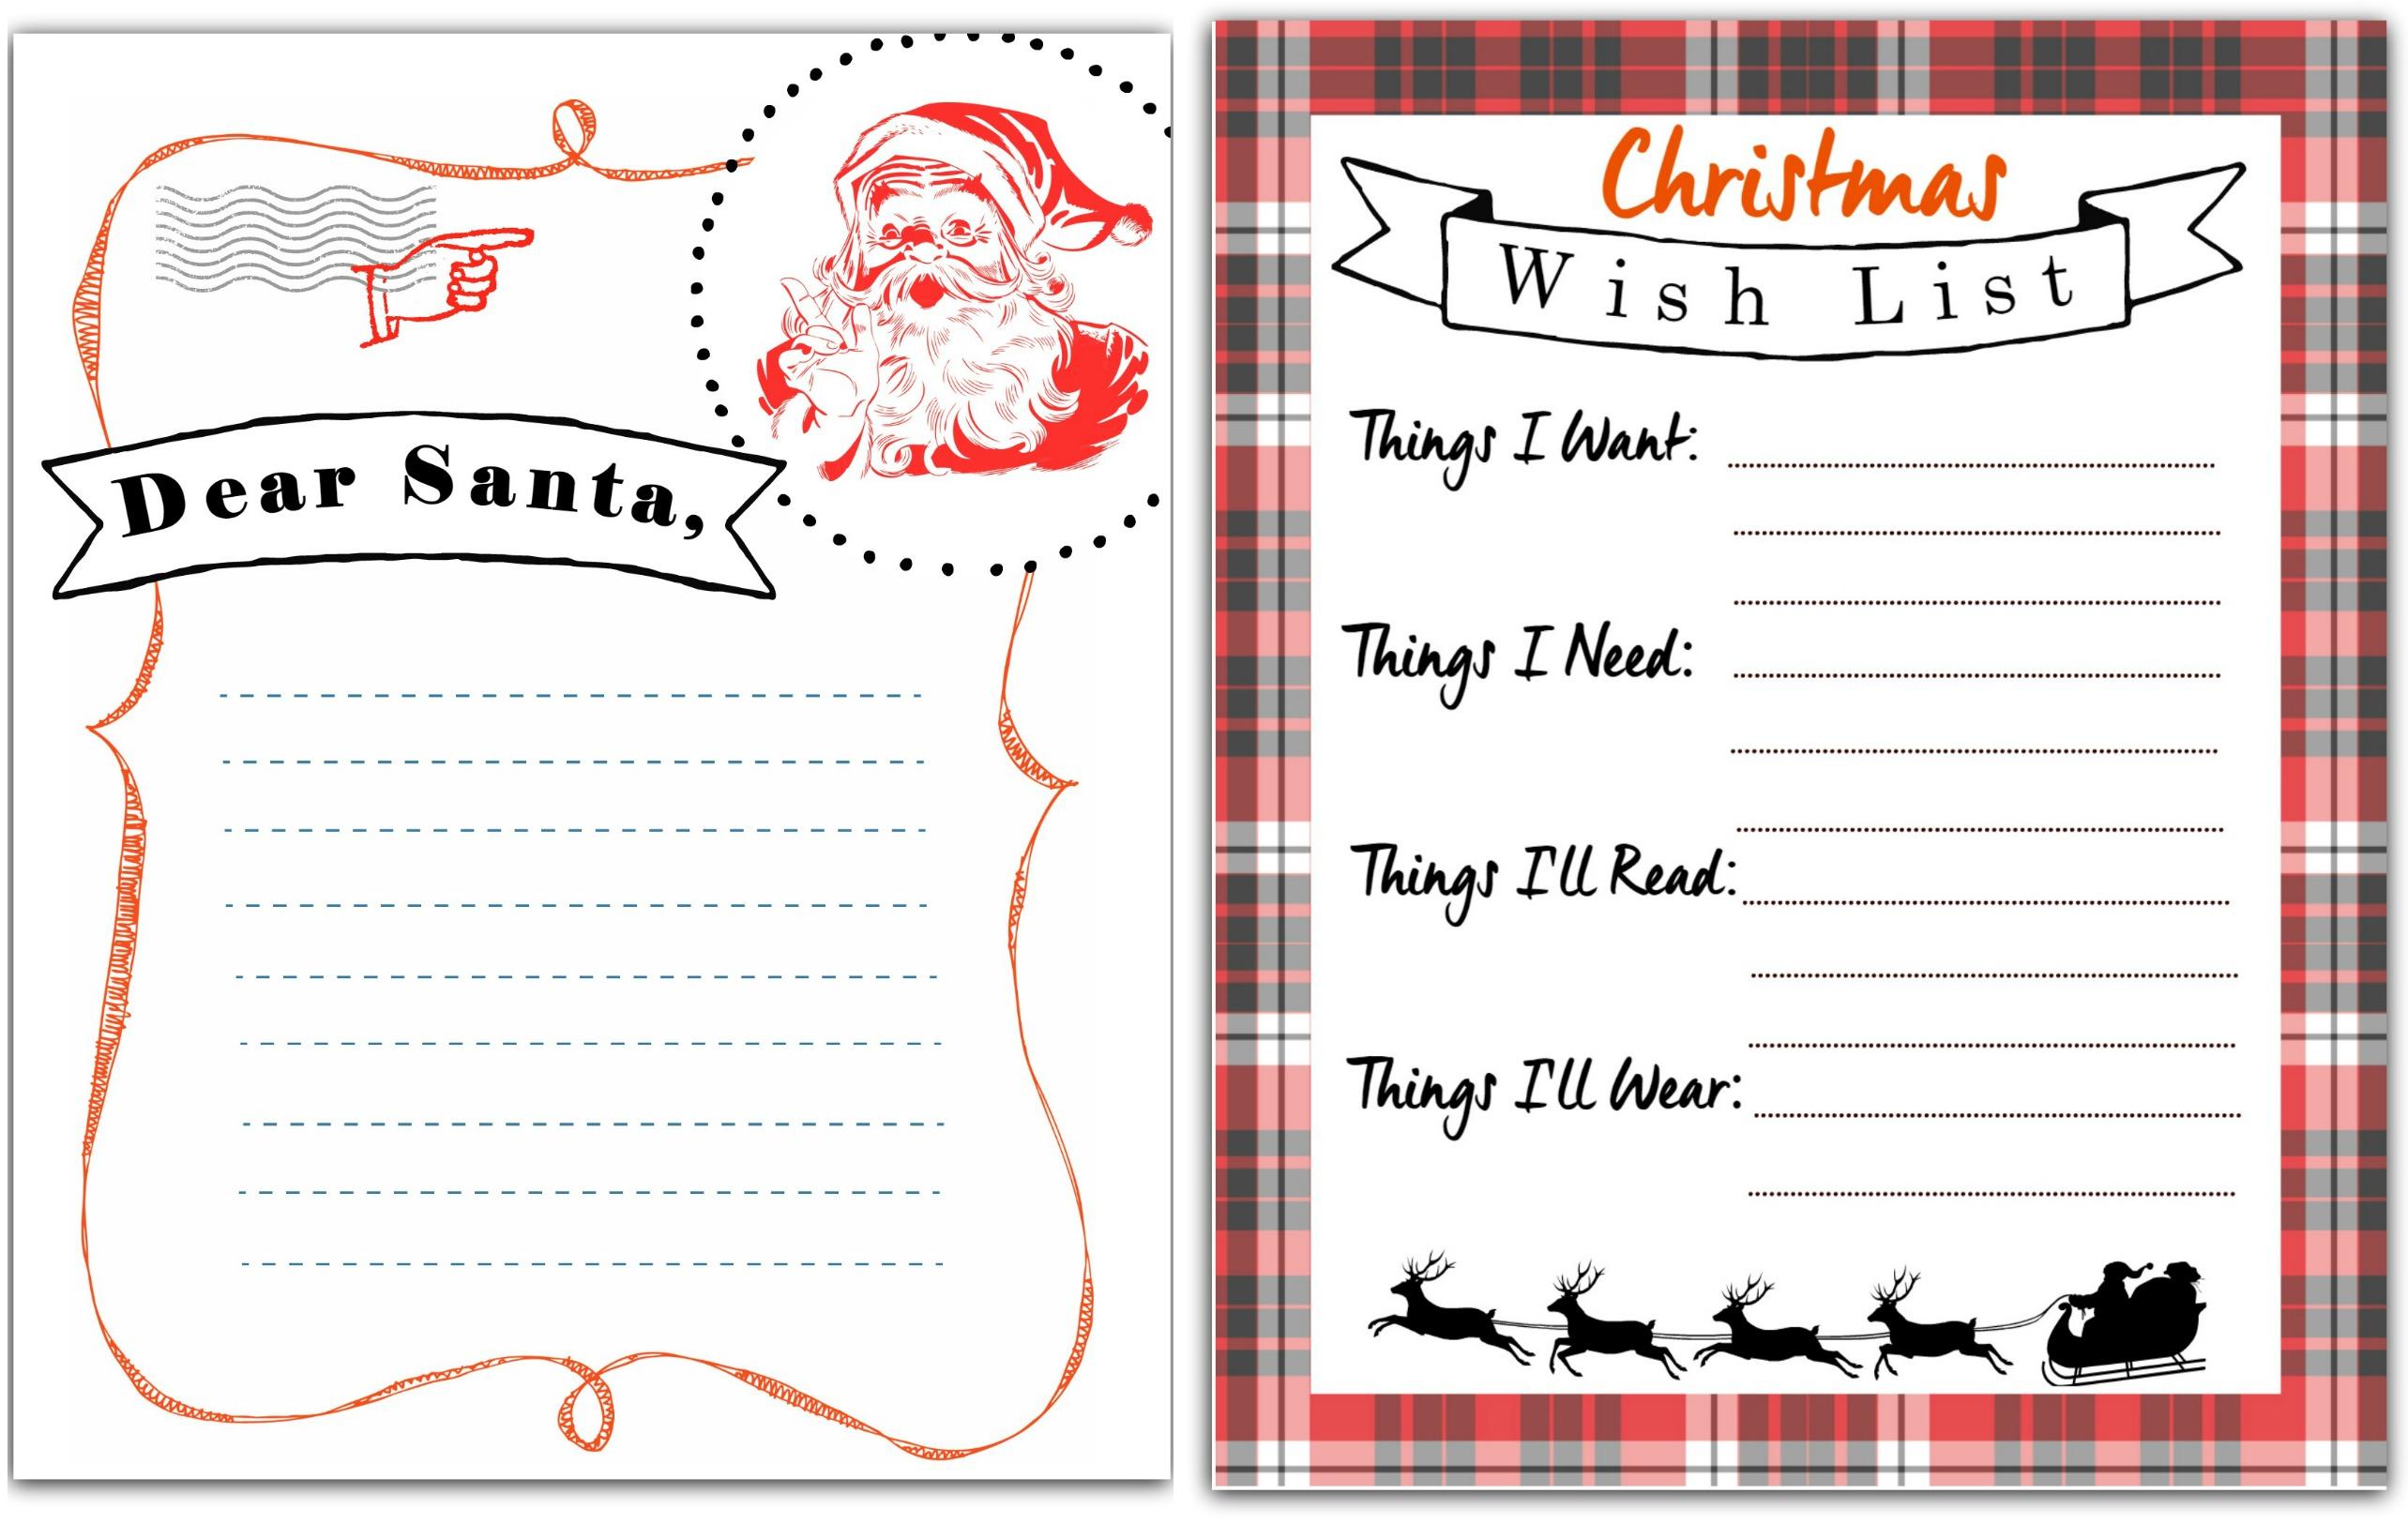 photograph regarding Printable Letterhead From Santa titled Totally free Printable Letter towards Santa Xmas Want Listing - Hip2Help you save